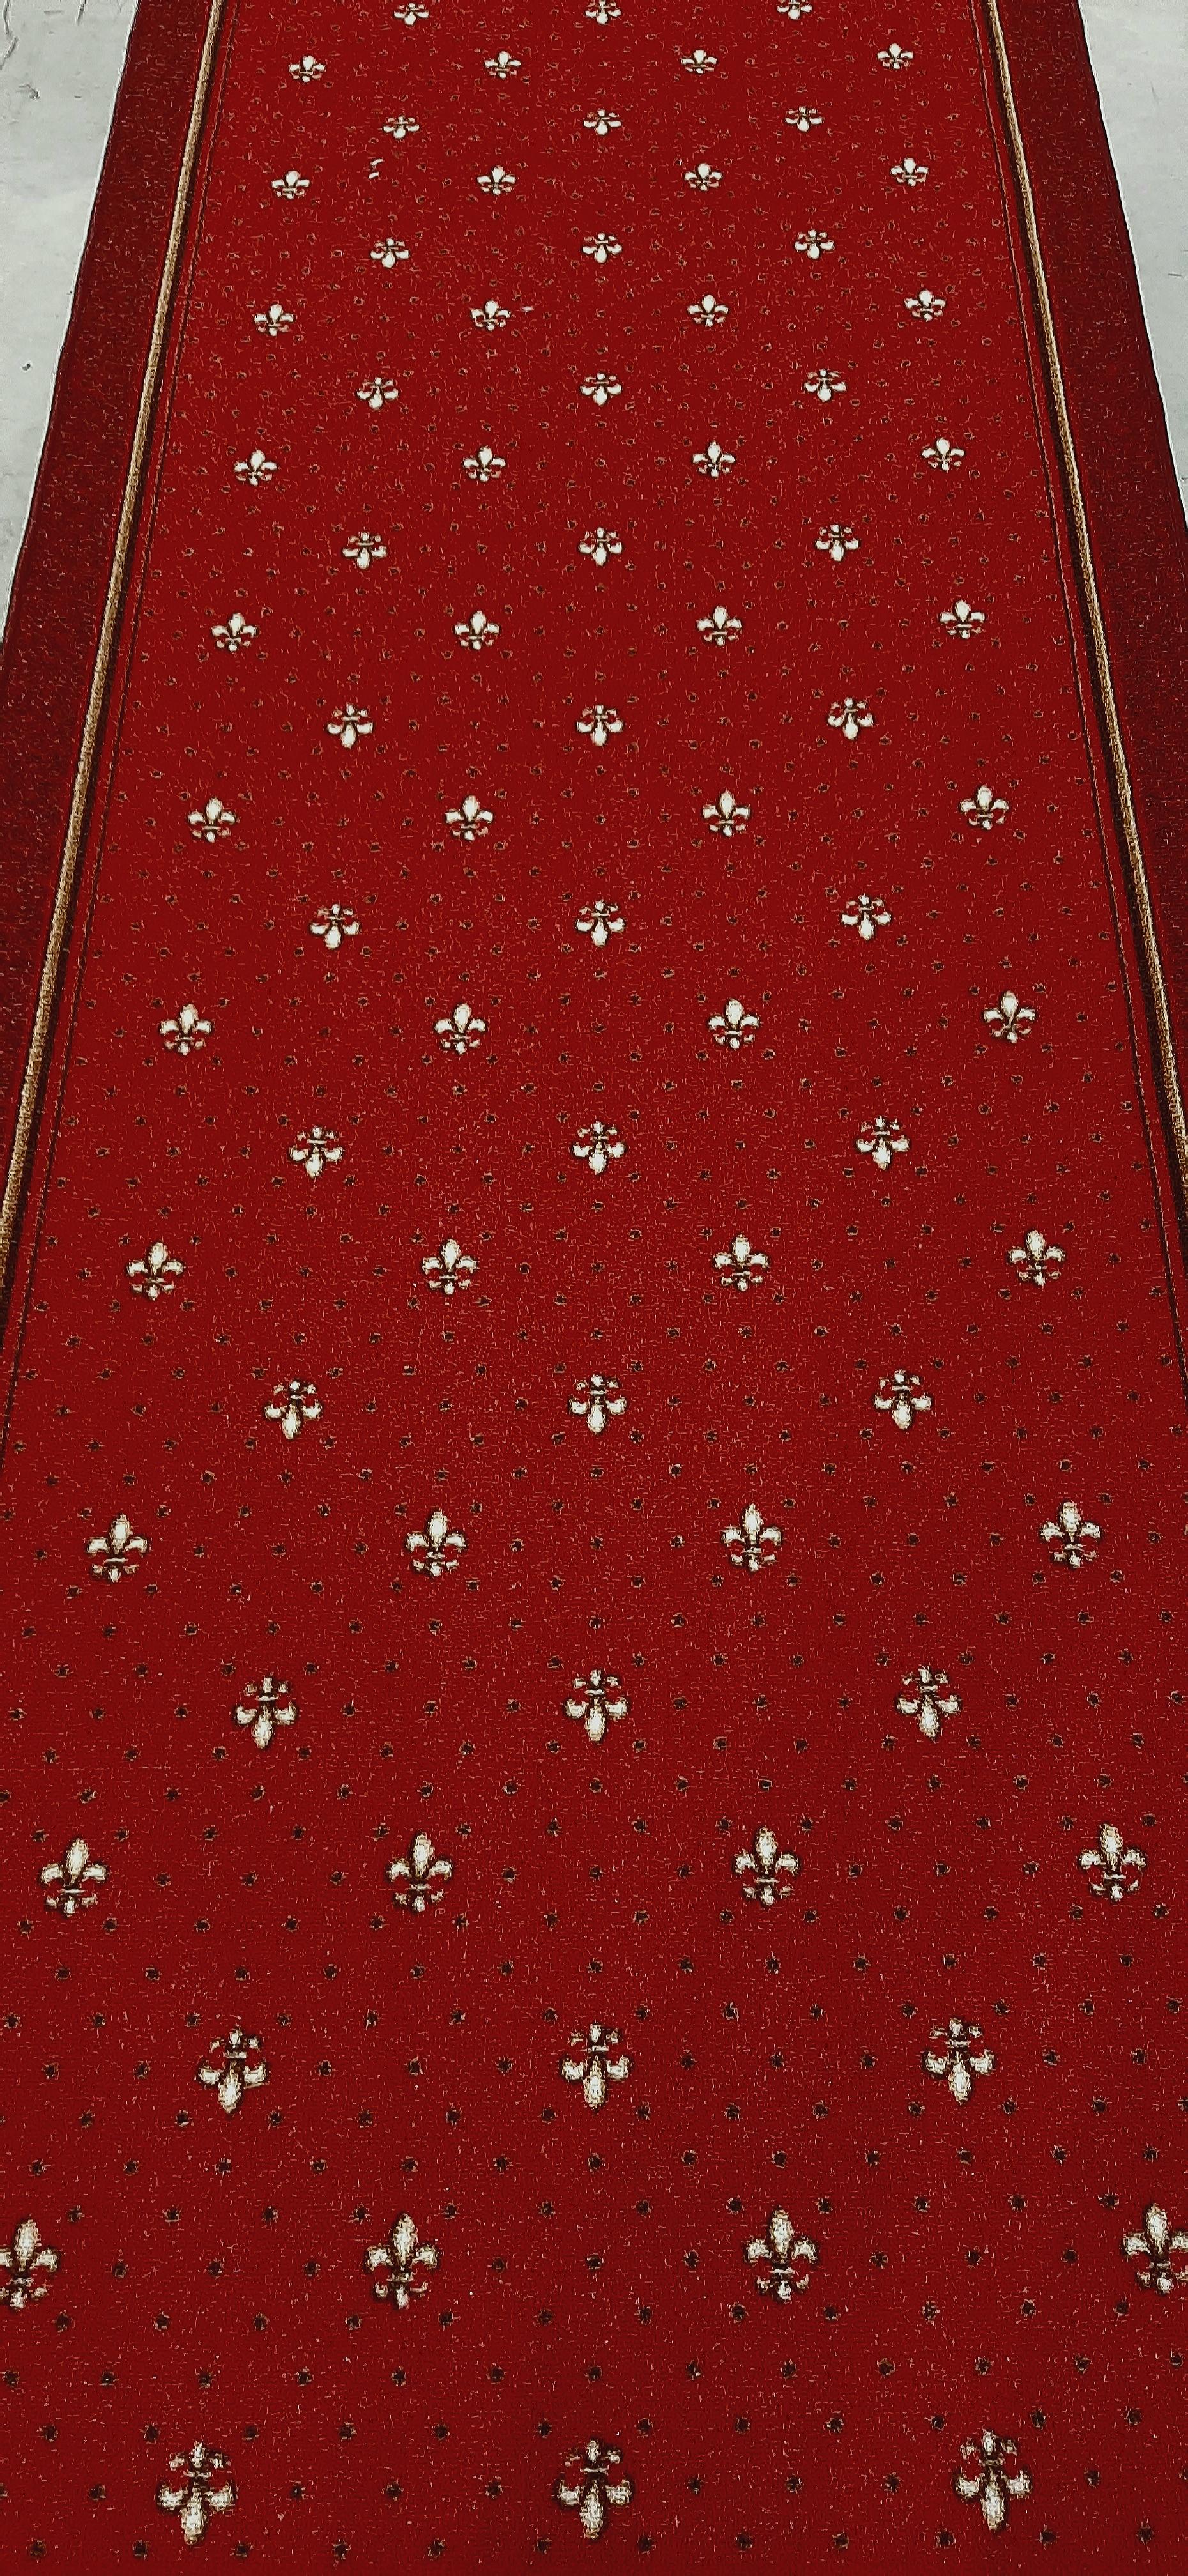 Traversa Tesatura Plata 1835, Rosu, 100x1000 cm, 820 gr/mp [1]